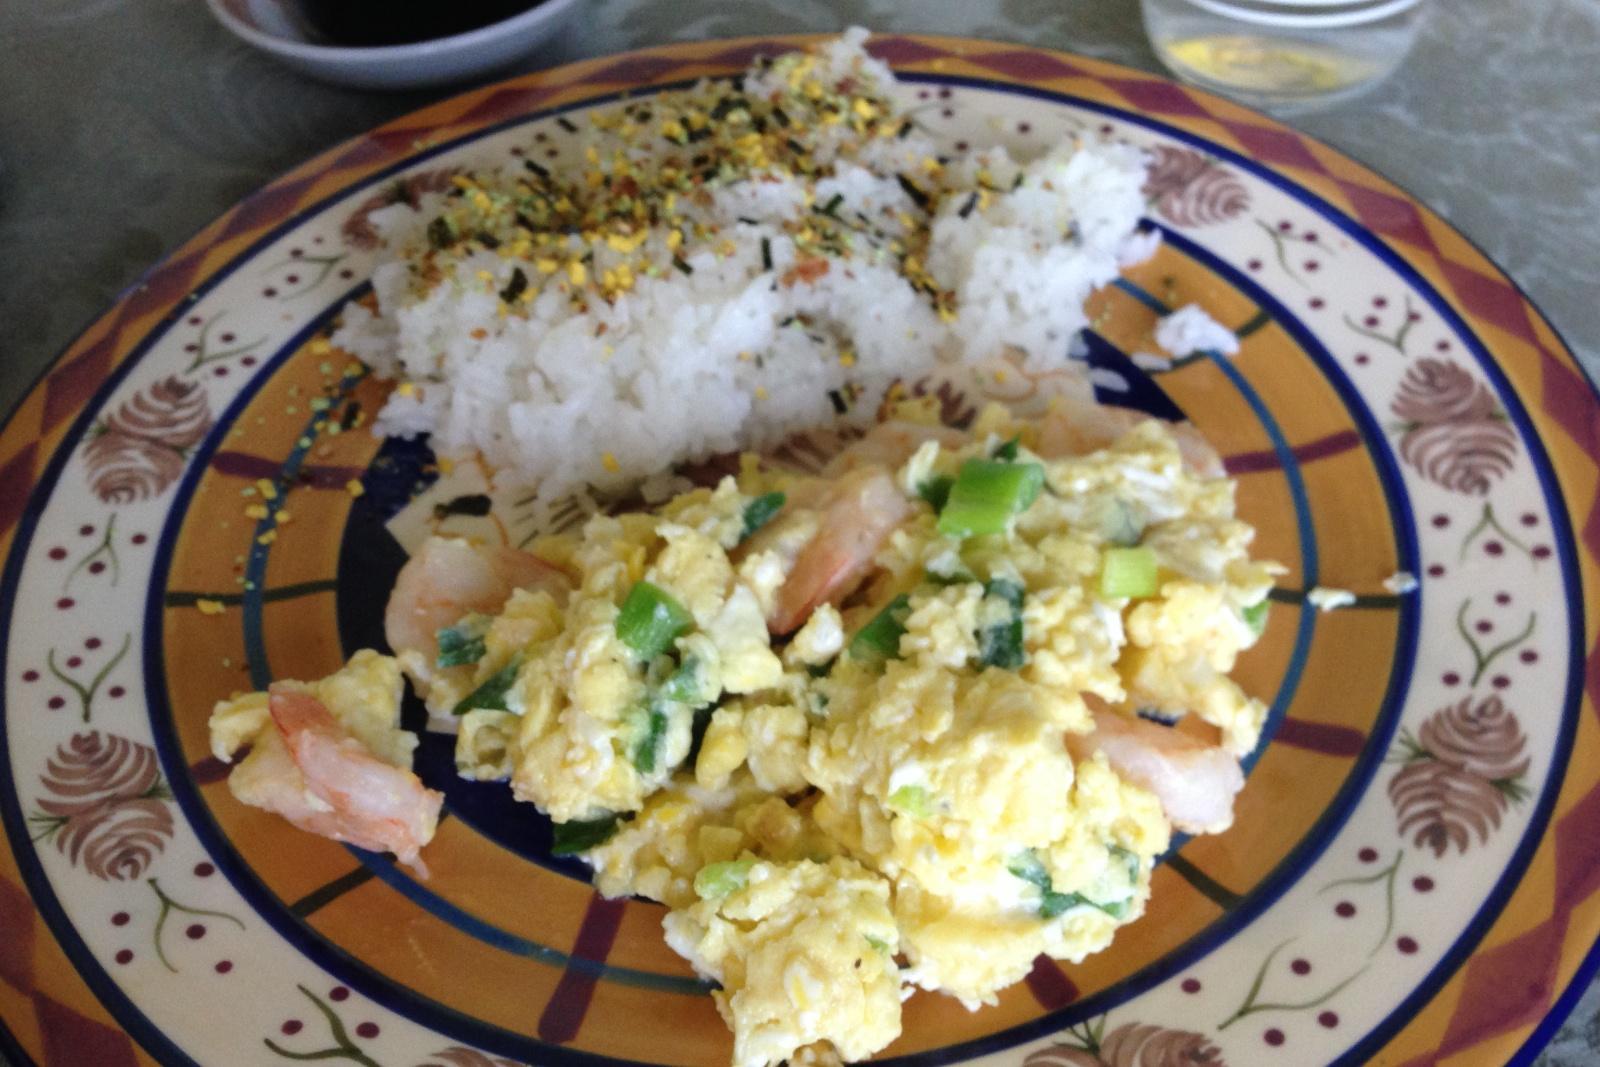 http://blog.rickk.com/food/2014/05/26/ate.2014.05.26.l.jpg